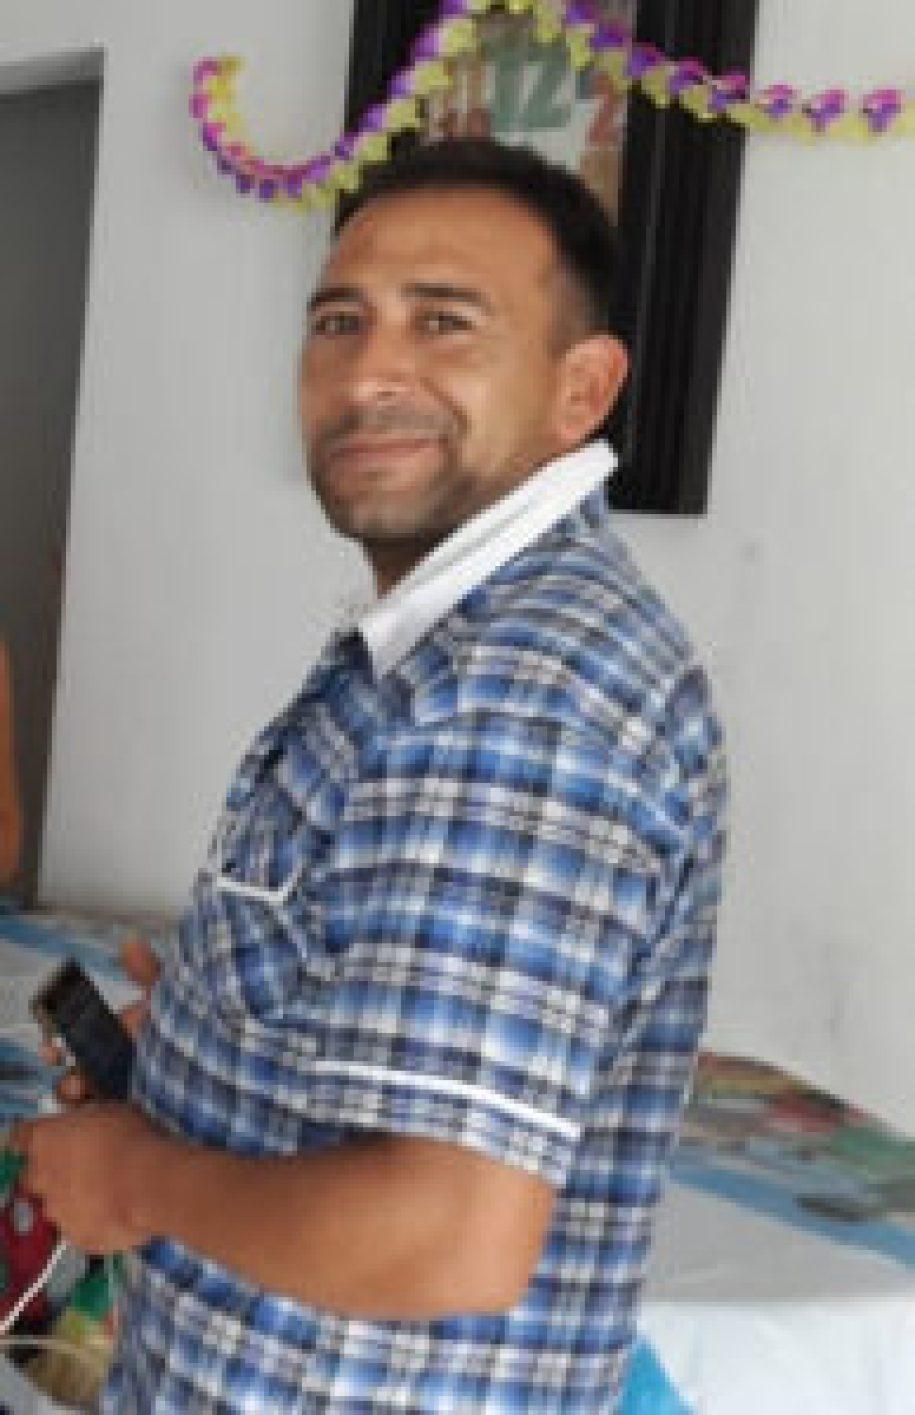 Luis Leiva, tripulante ARA San Juan